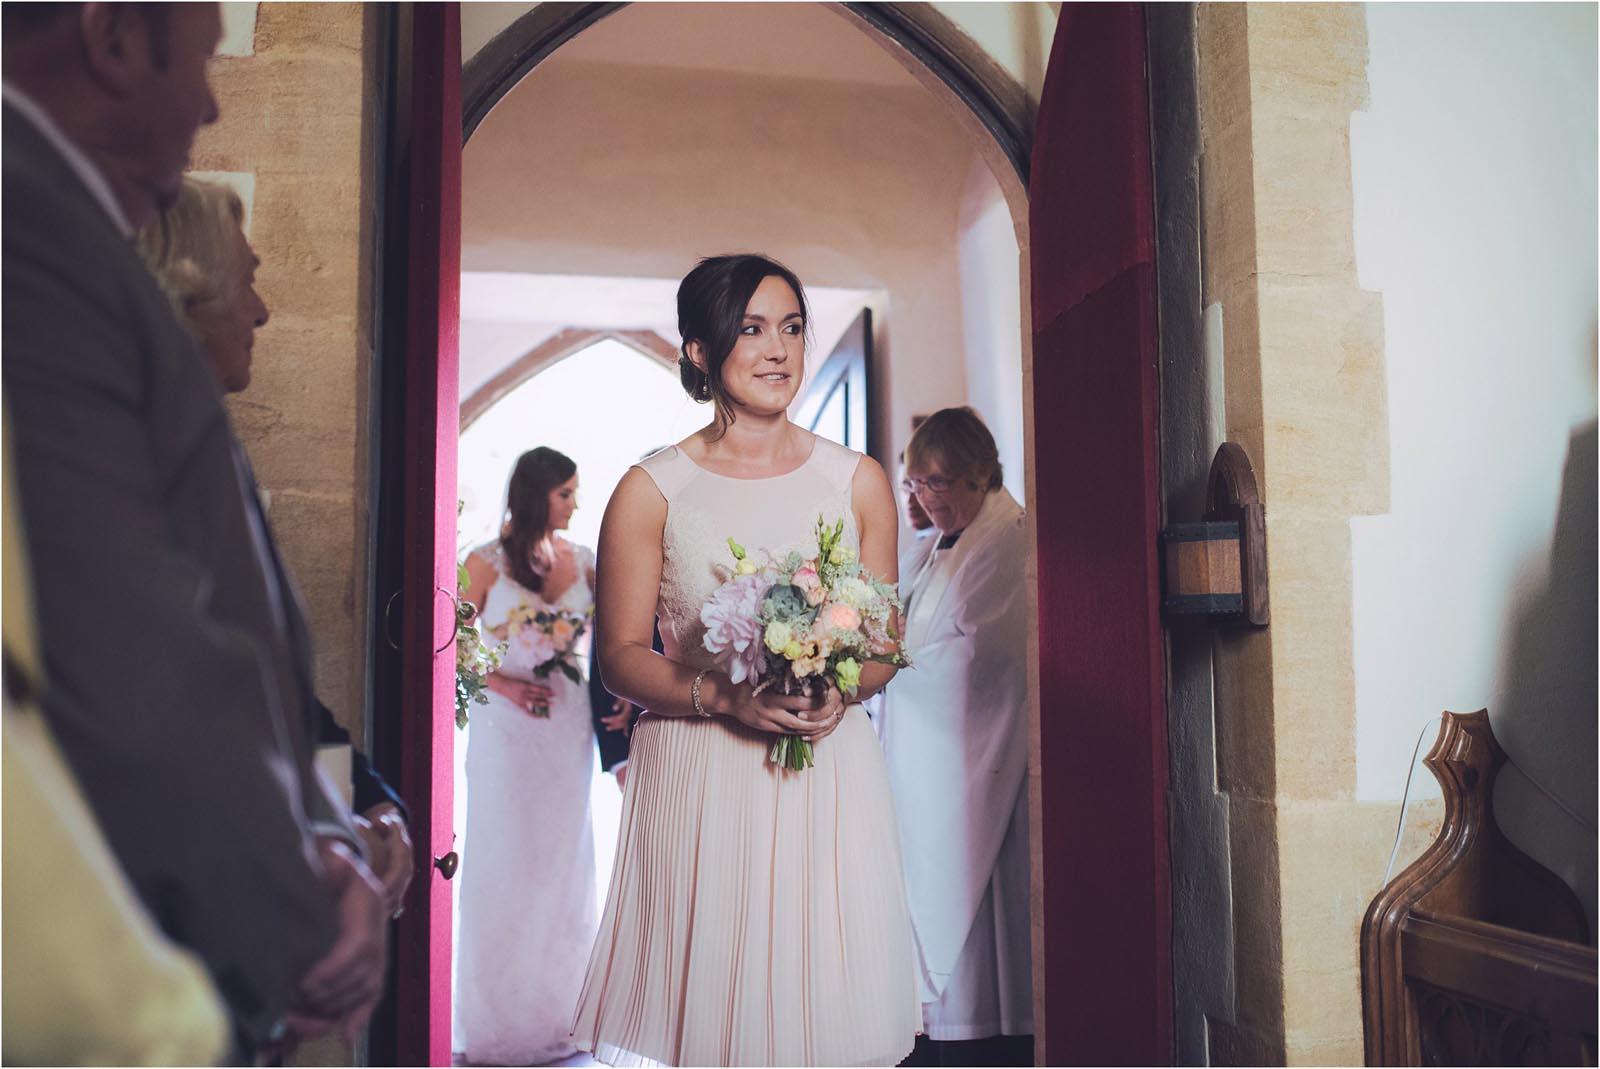 Simon biffen wedding photography 0060